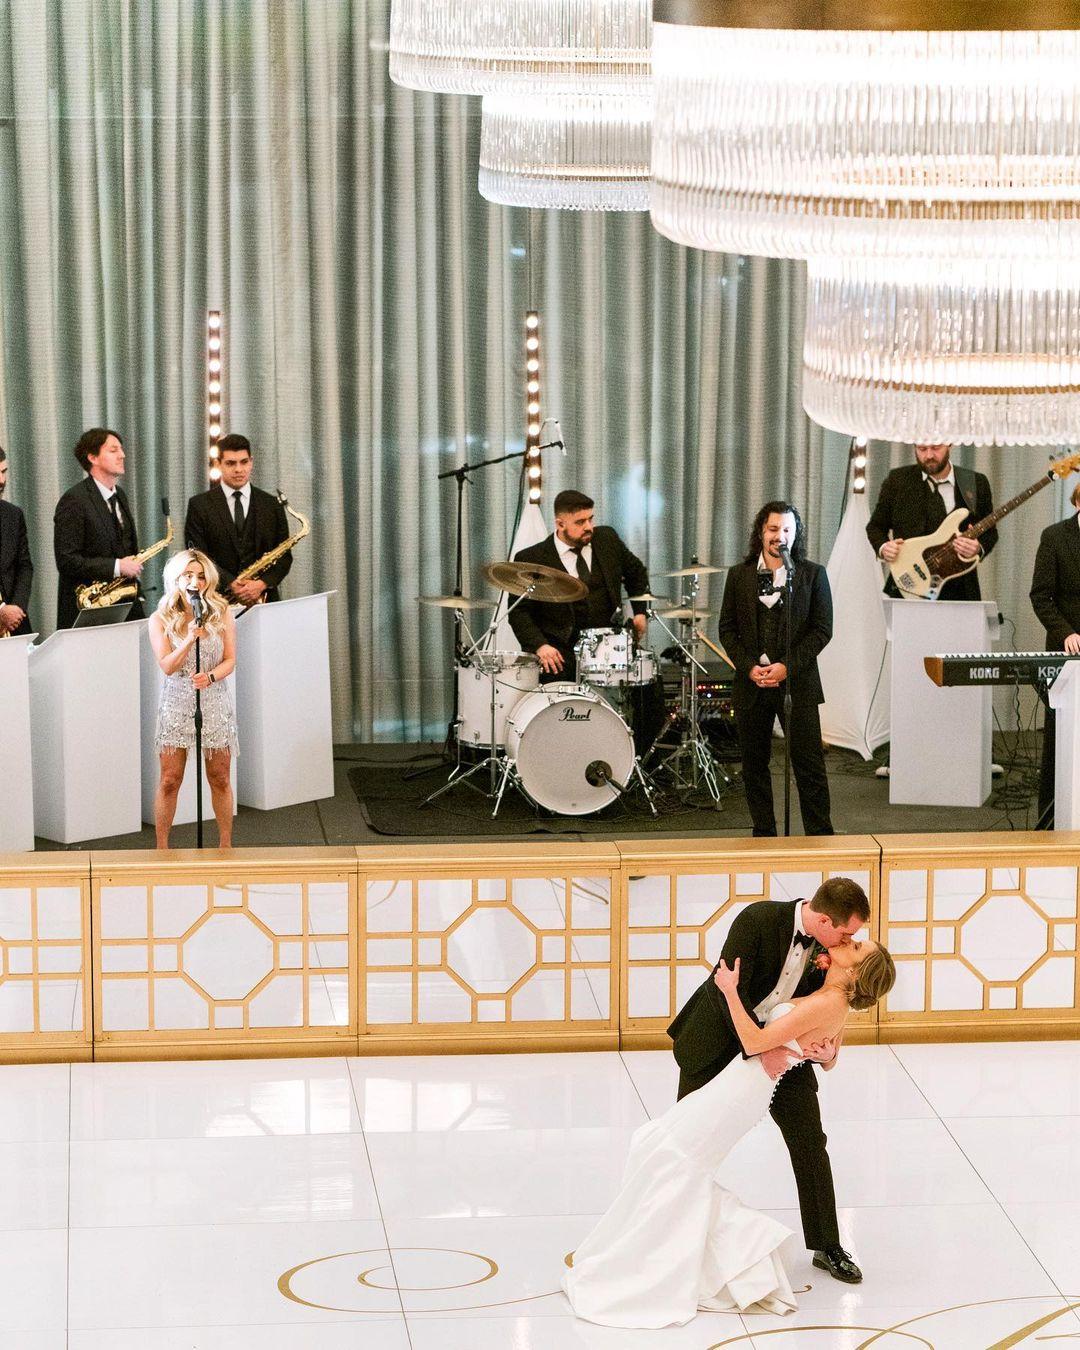 Thompson Hotel Dallas wedding venue